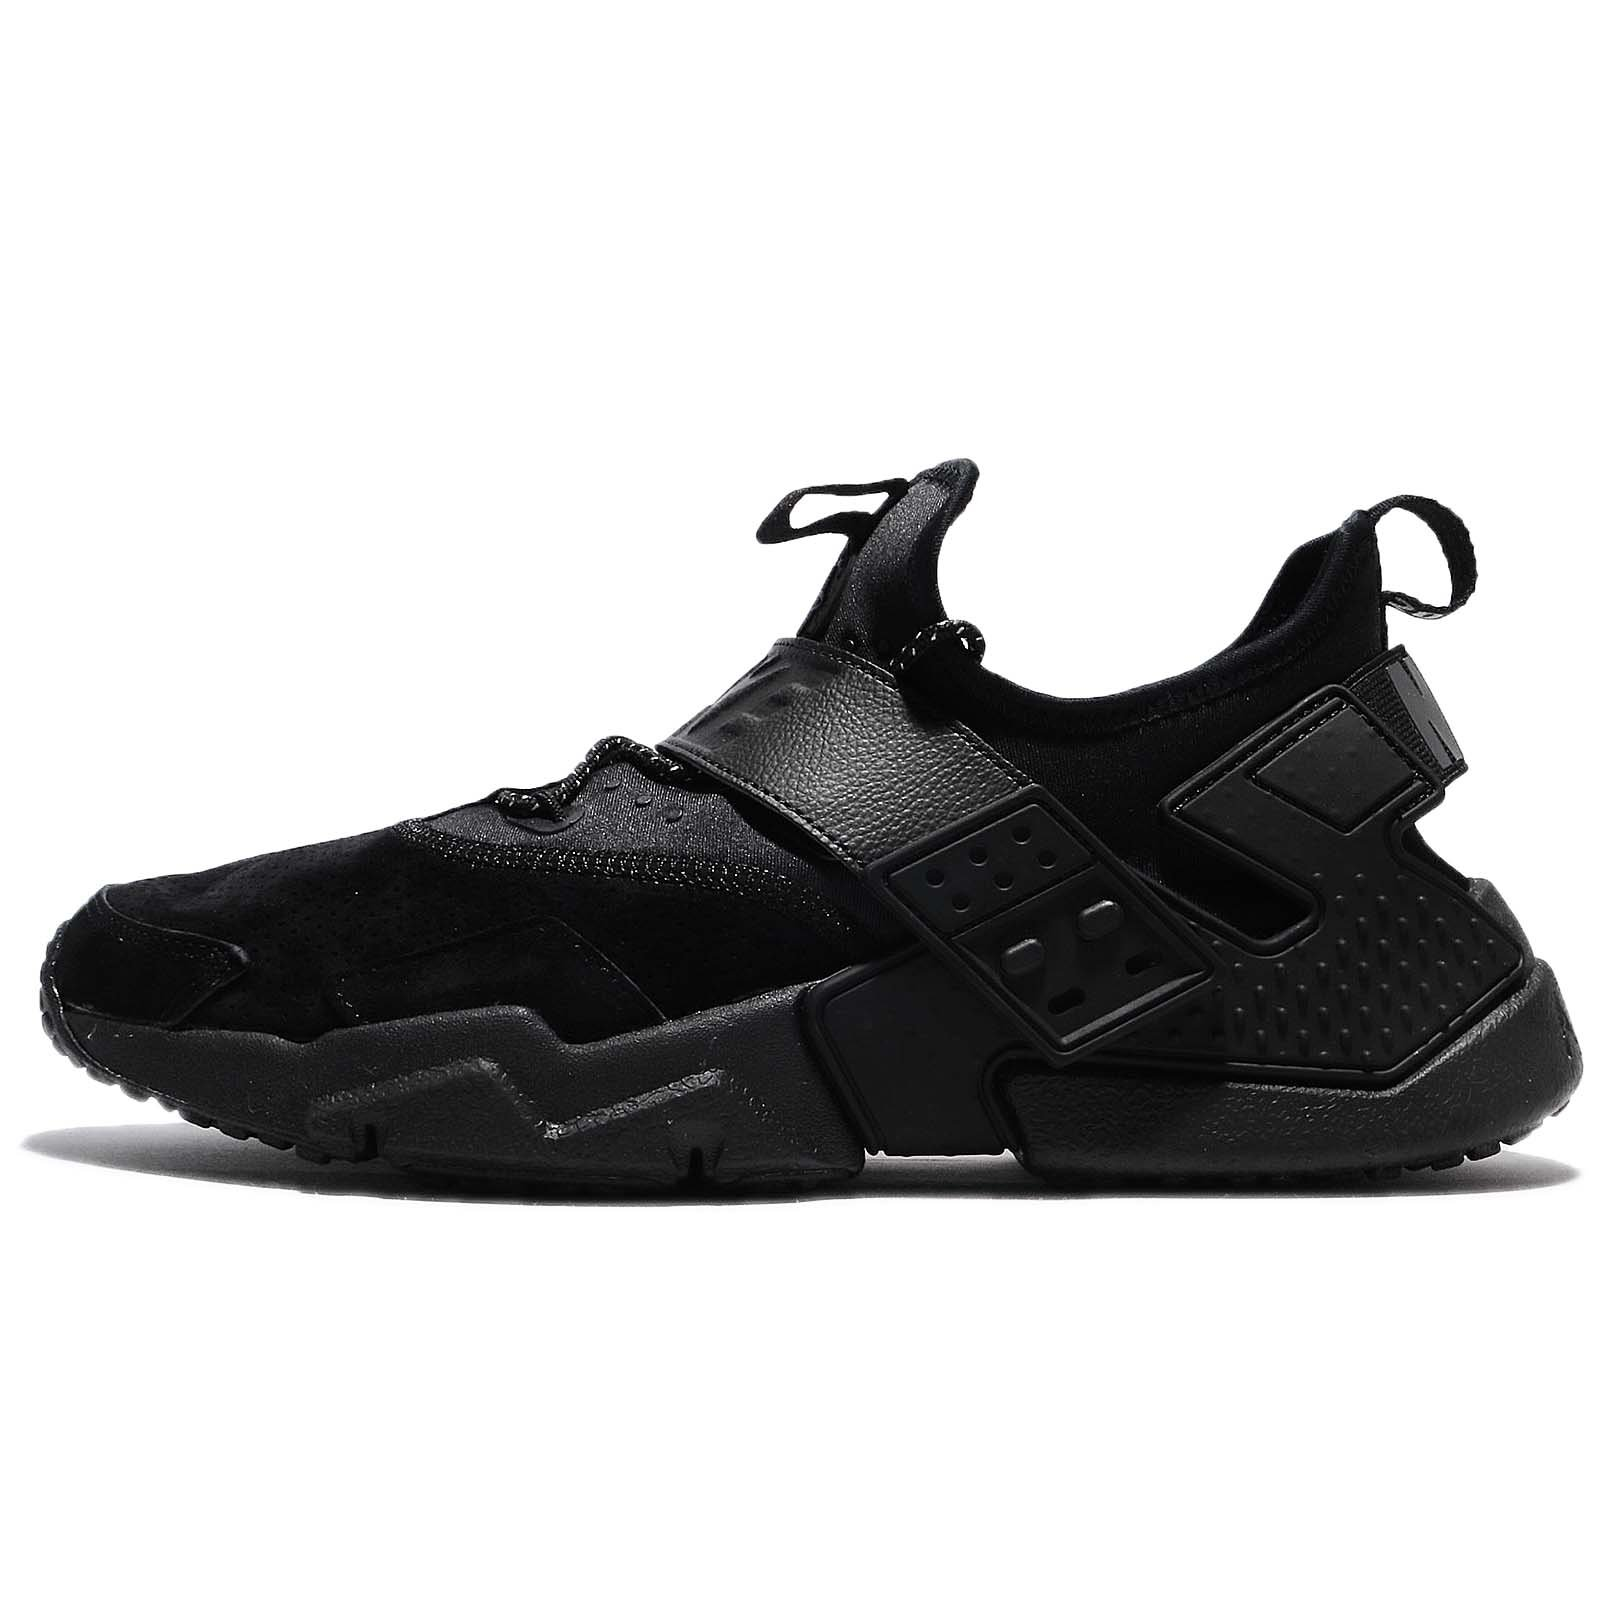 detailed look de4c7 ae824 Galleon - Nike Air Huarache Drift Premium Men s Shoes Black Anthracite  Ah7335-001 (7.5 D(M) US)